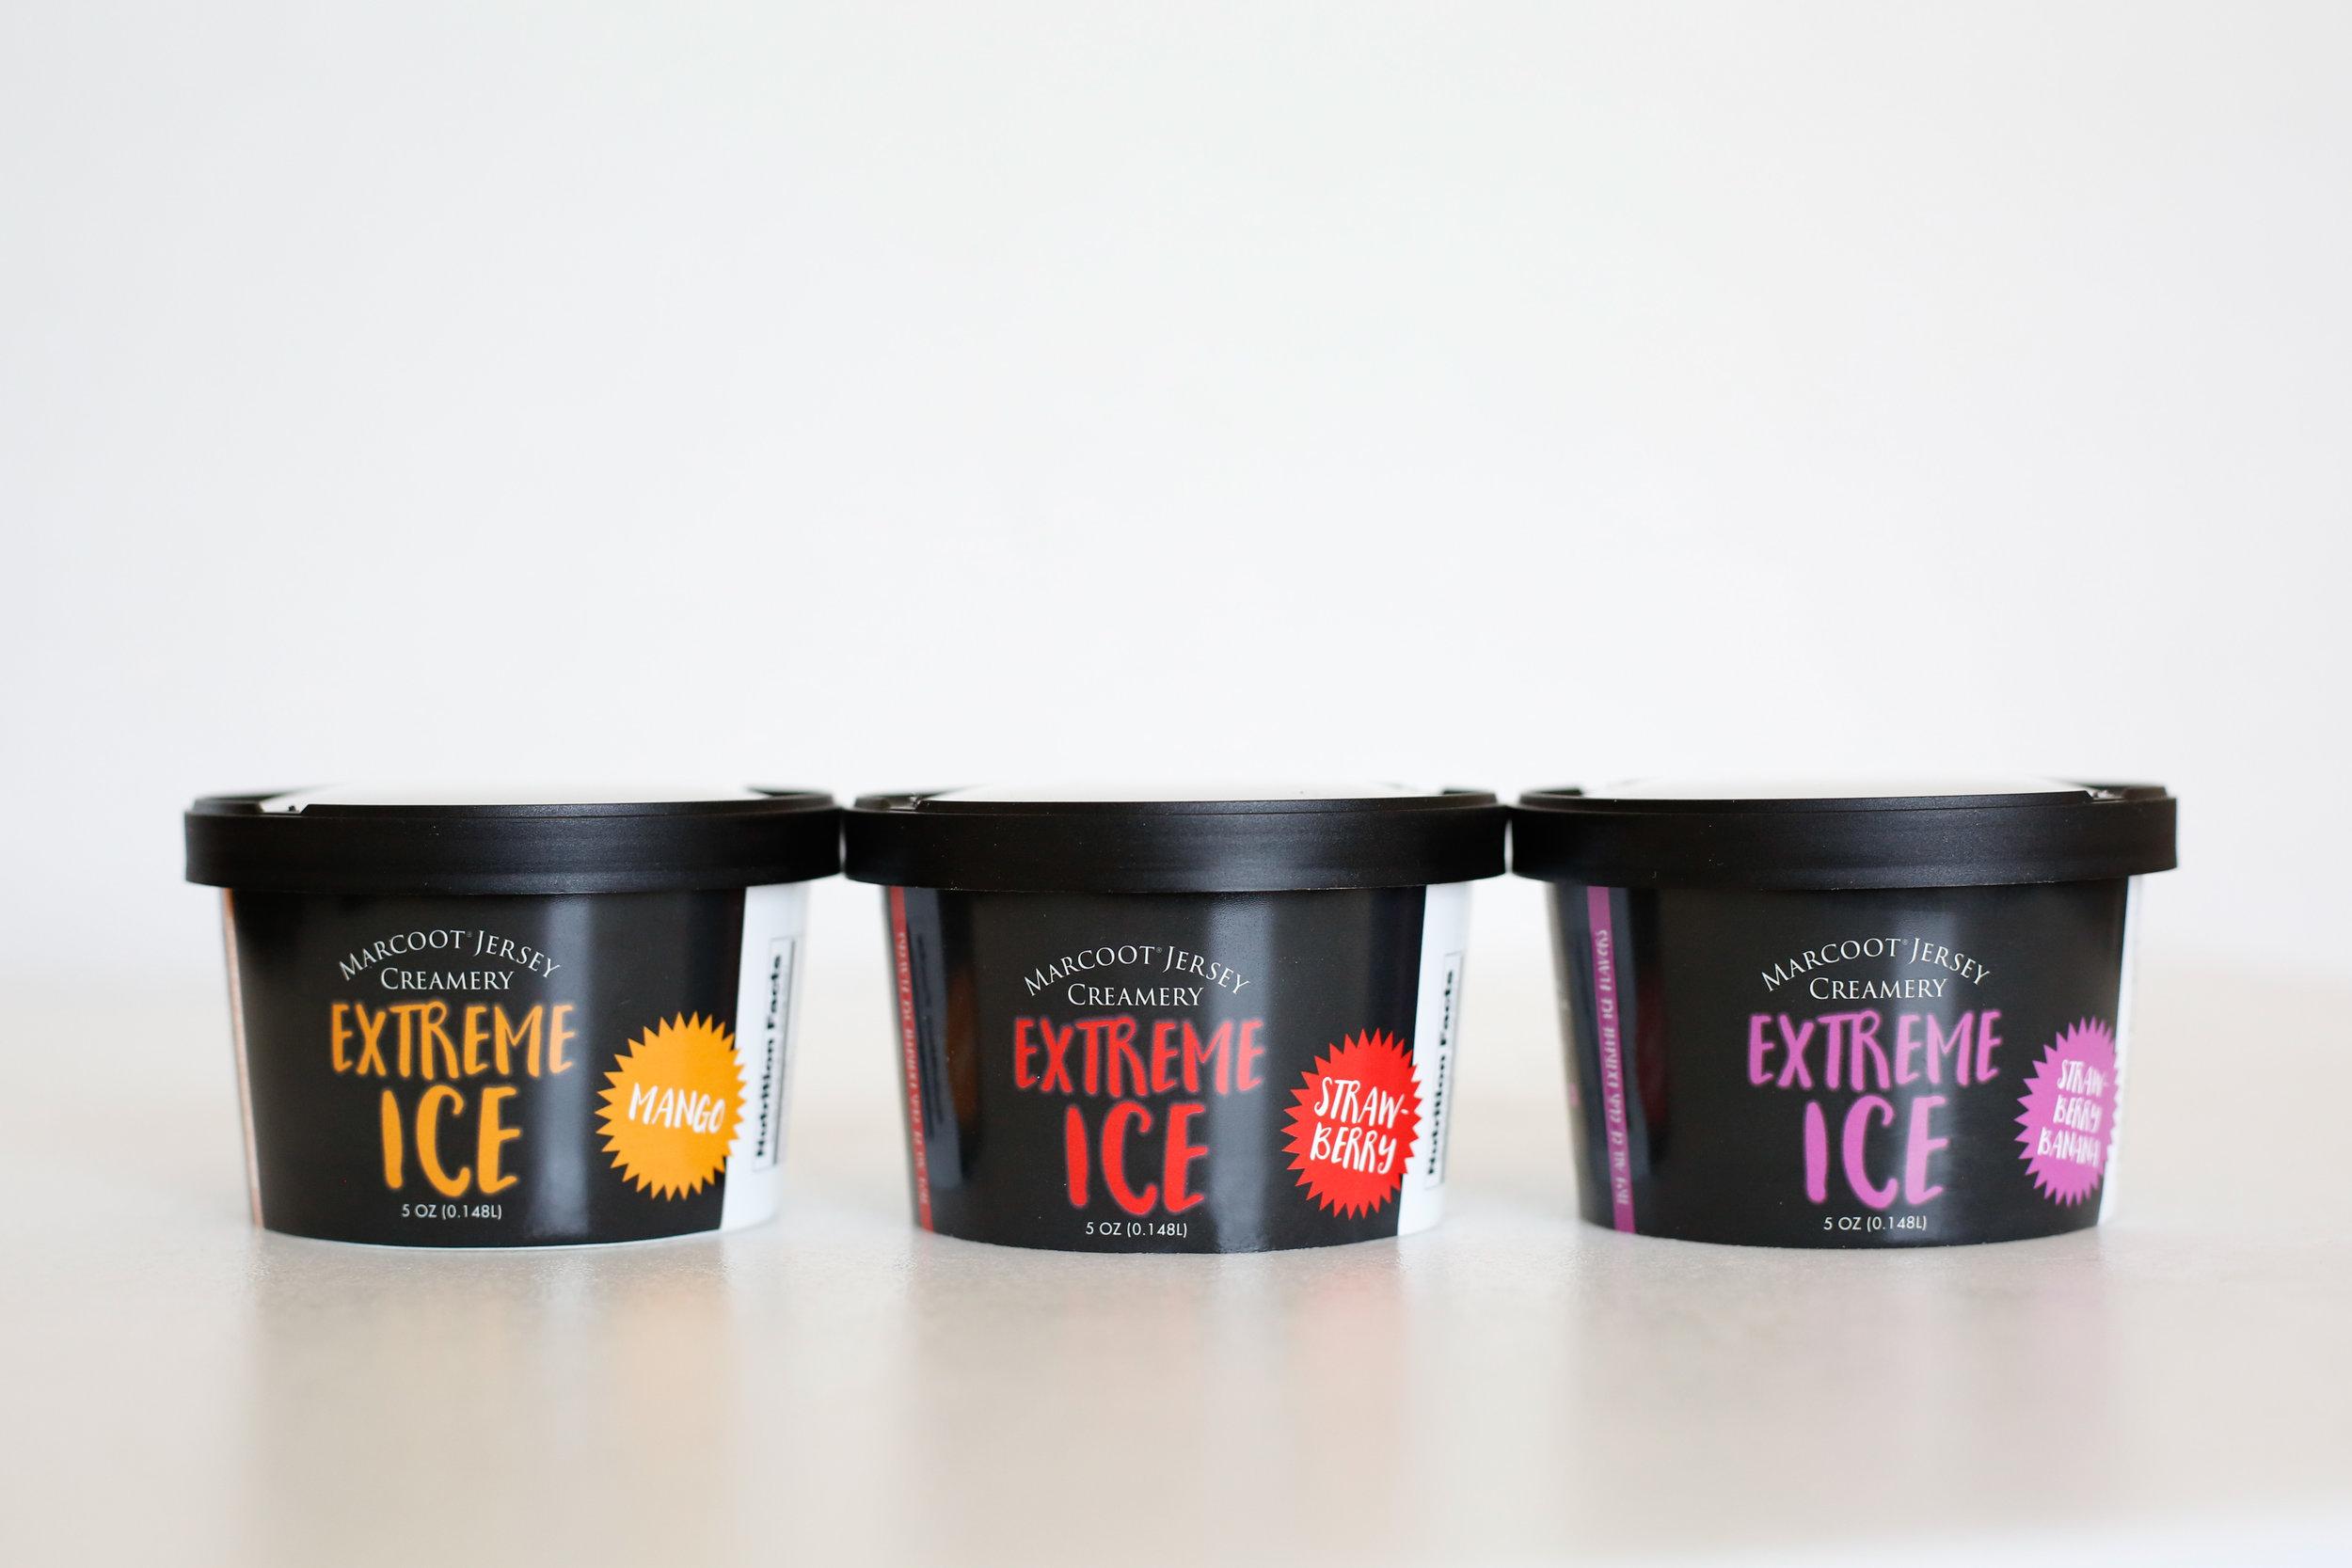 whey ice marcoot jersey creamery july 2018-125.jpg